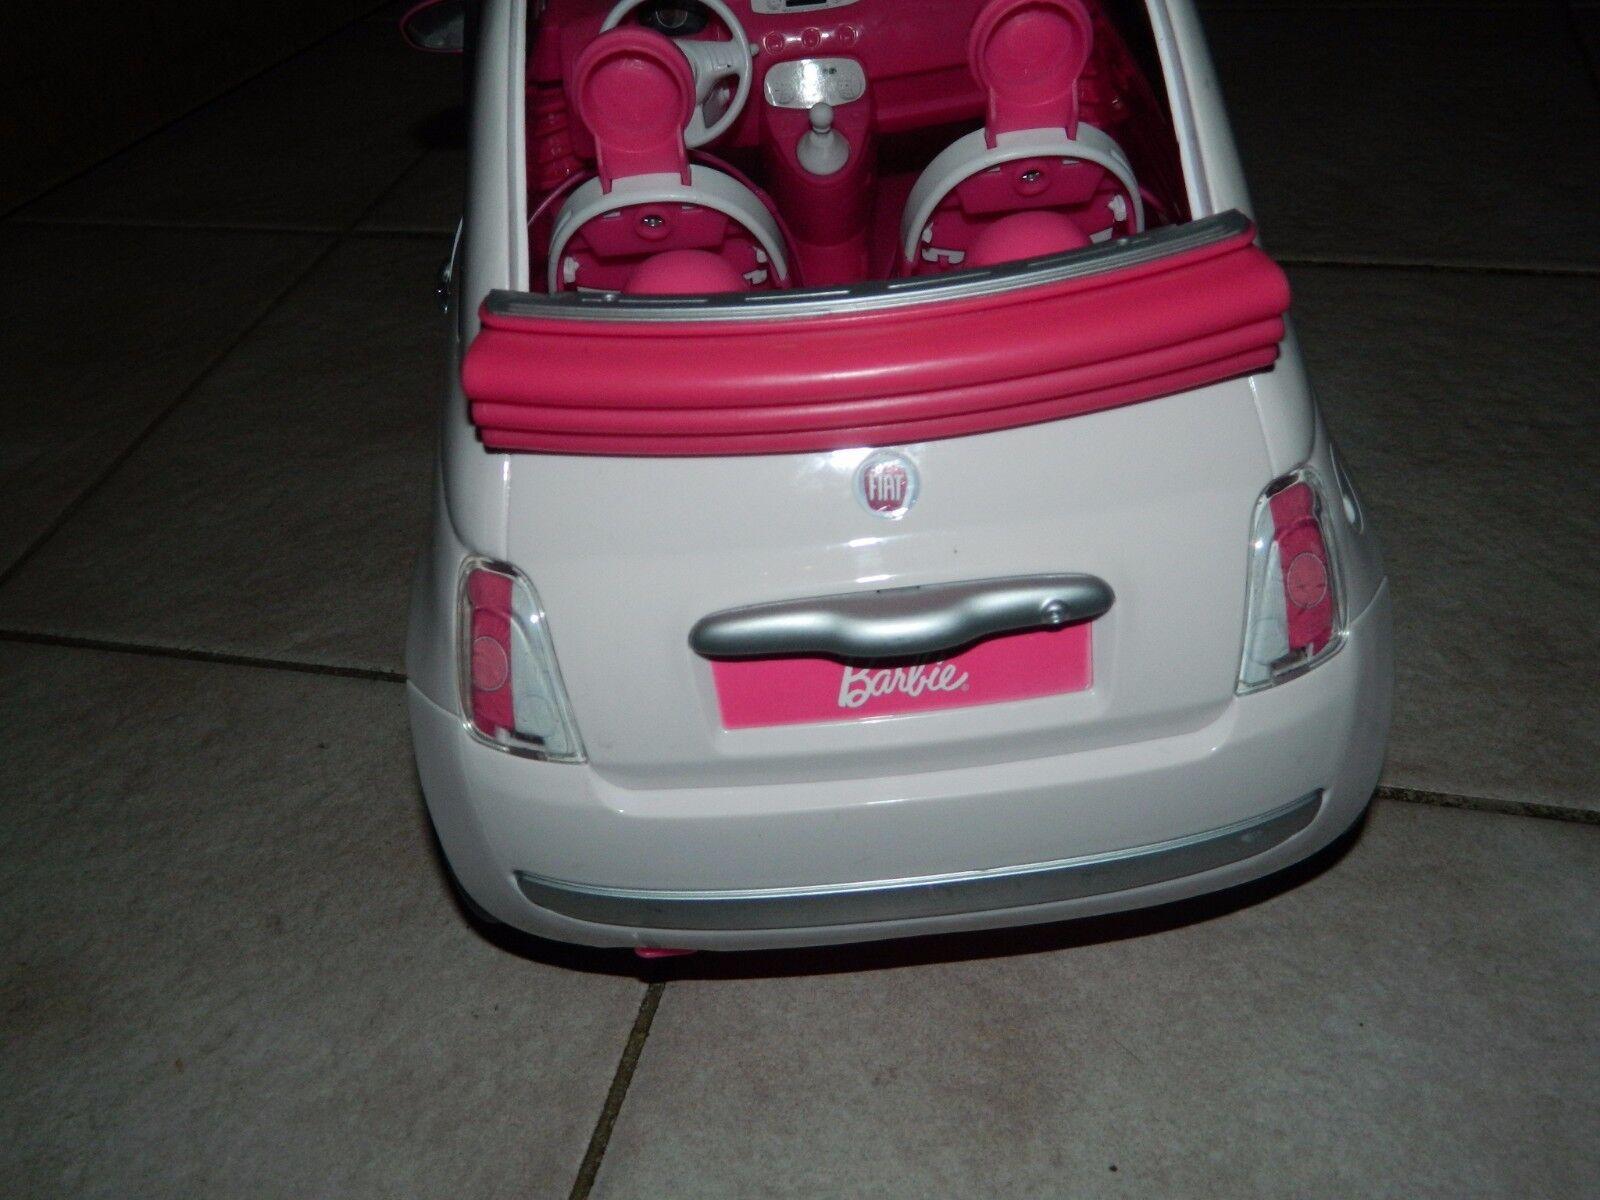 fiat 500 cabrio wei innen pink edles auto mit chrom. Black Bedroom Furniture Sets. Home Design Ideas